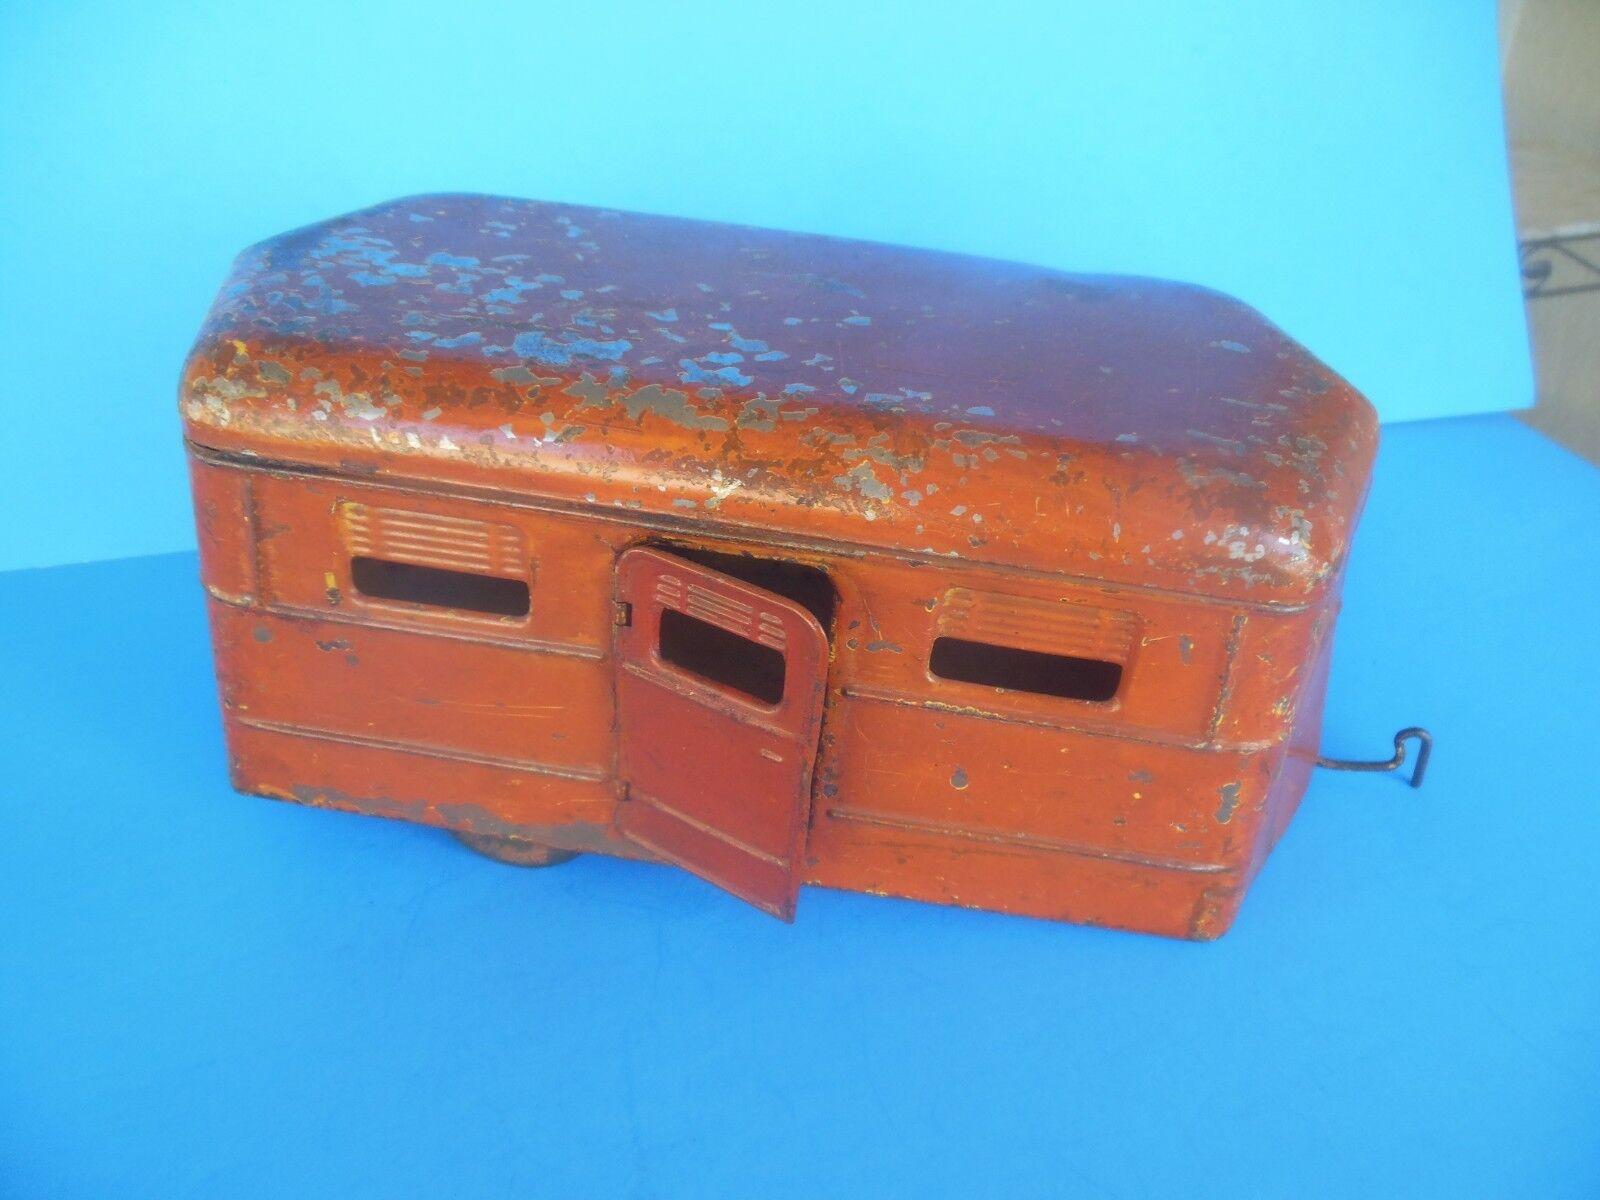 RARE 1930s KINGSBURY New Hampshire Metal Trailer Camper RV Caravan Toy Model